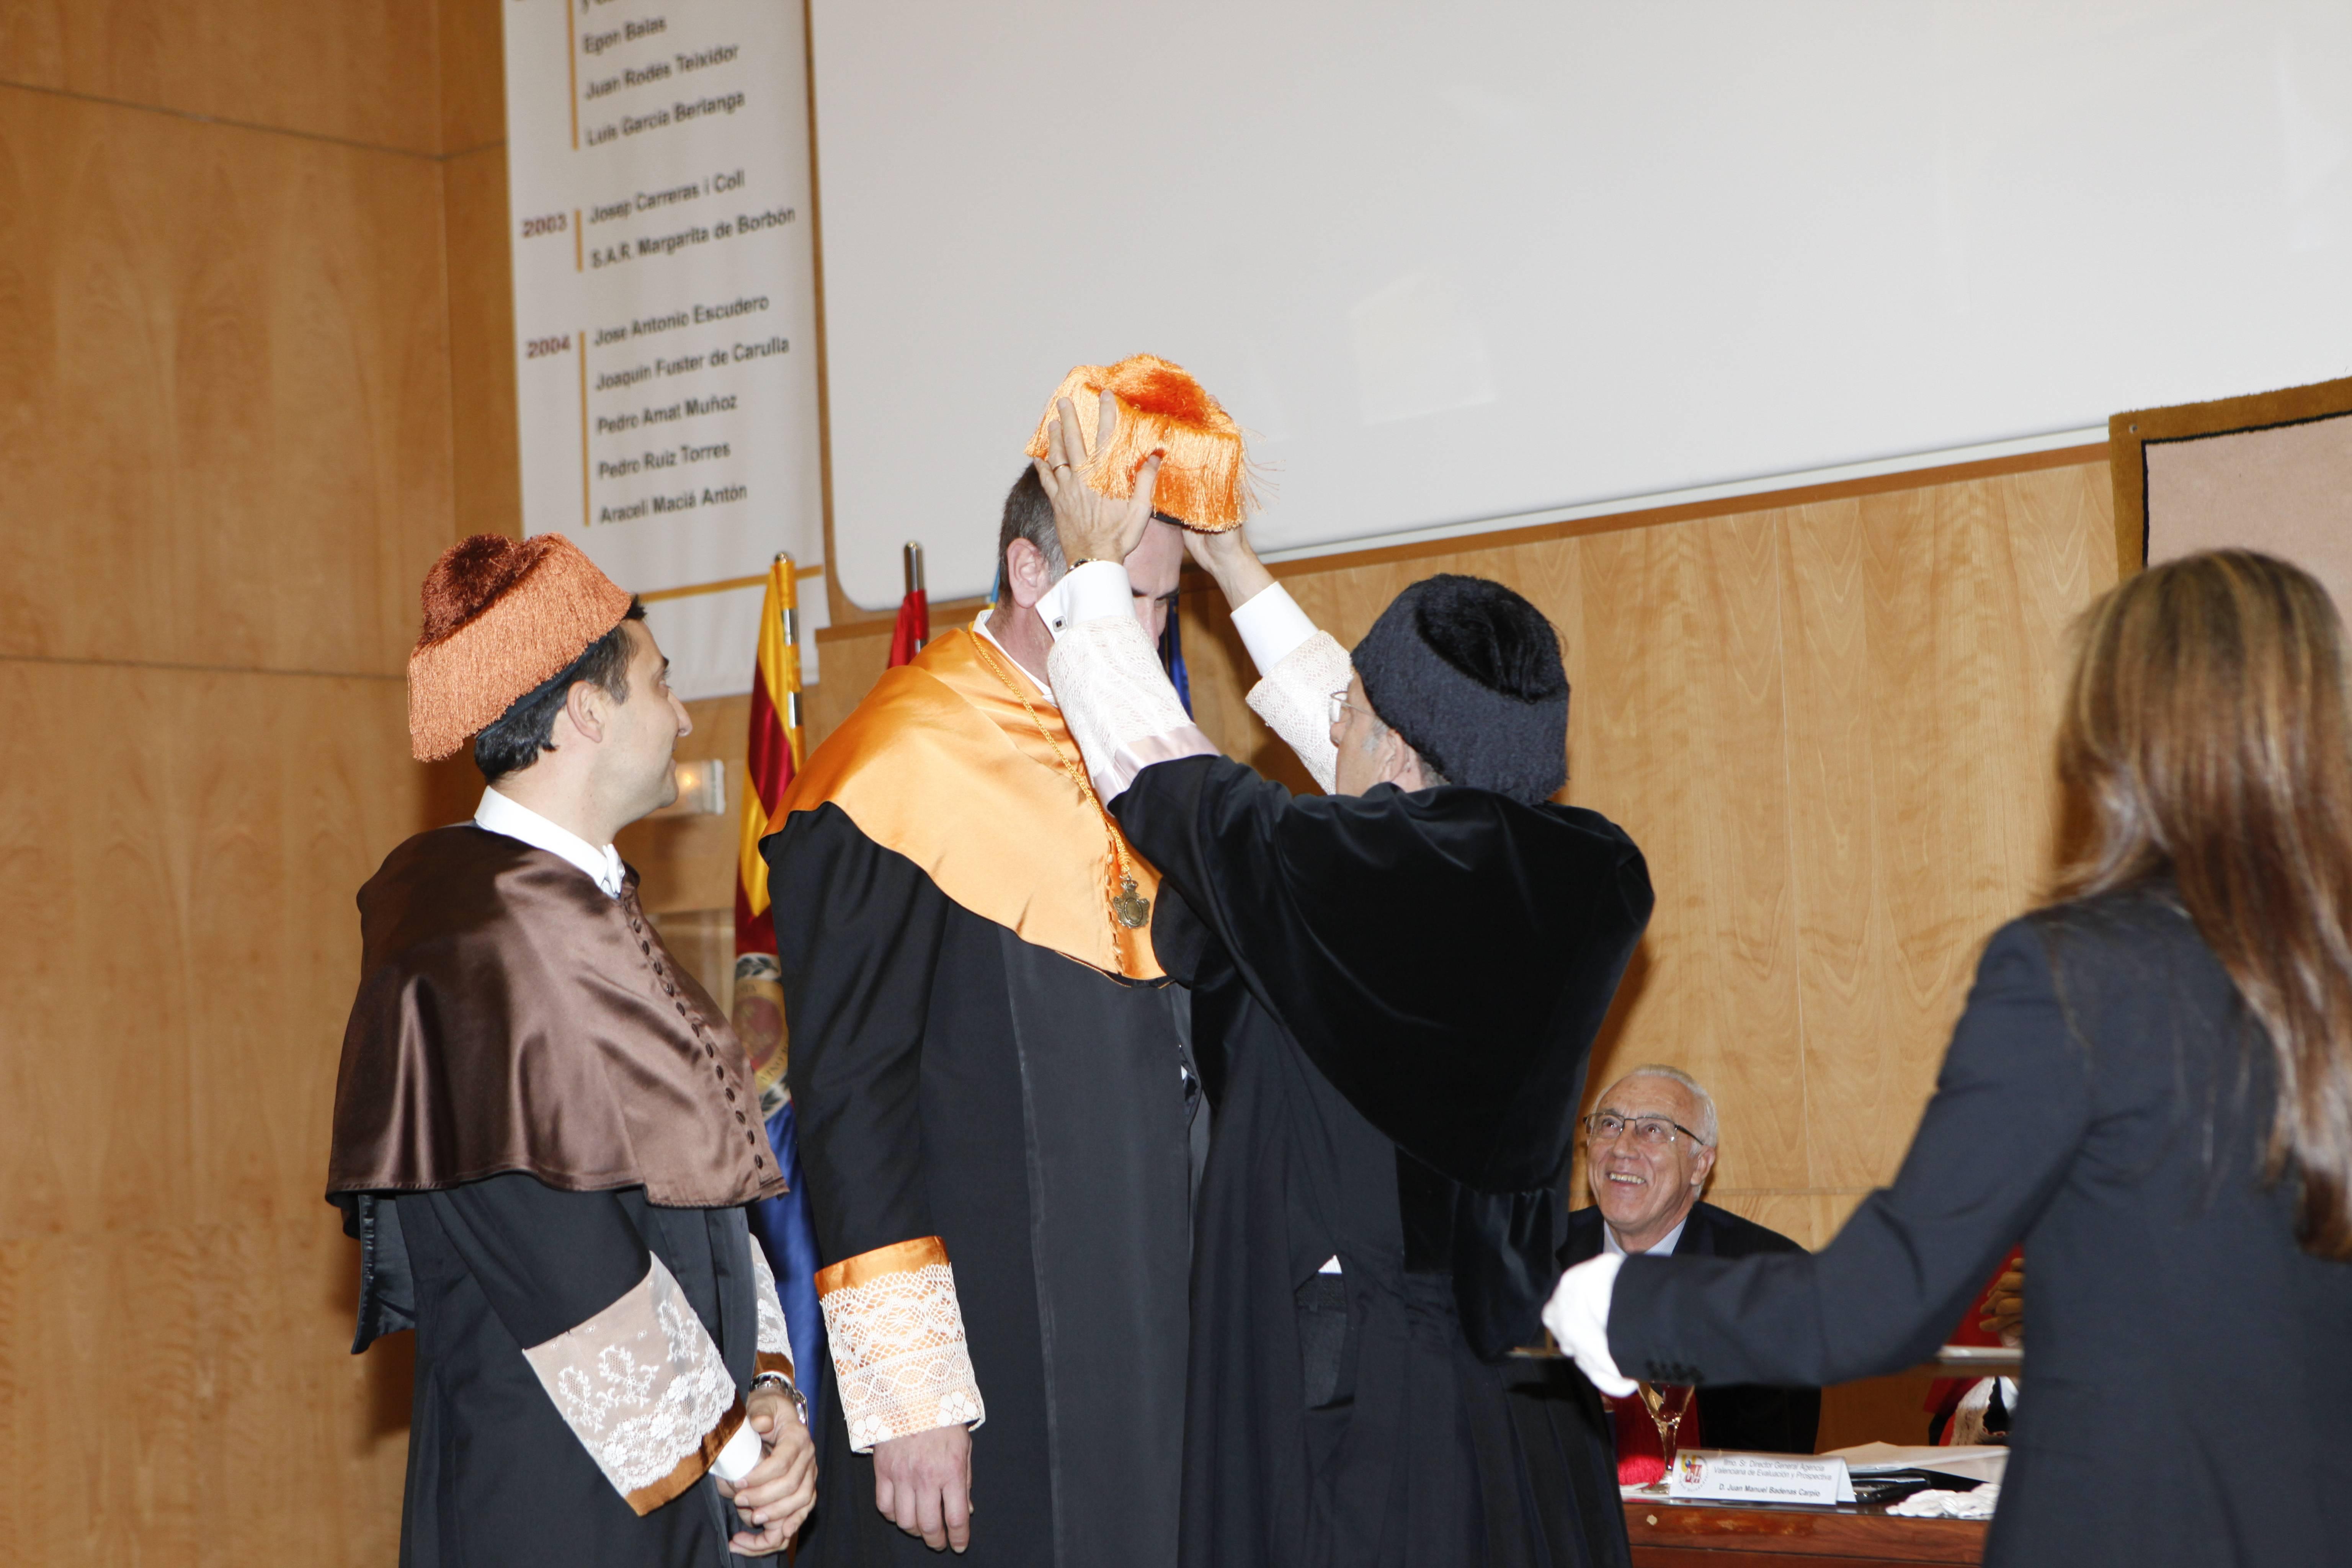 doctor-honoris-causa-luis-gamir_mg_1172.jpg